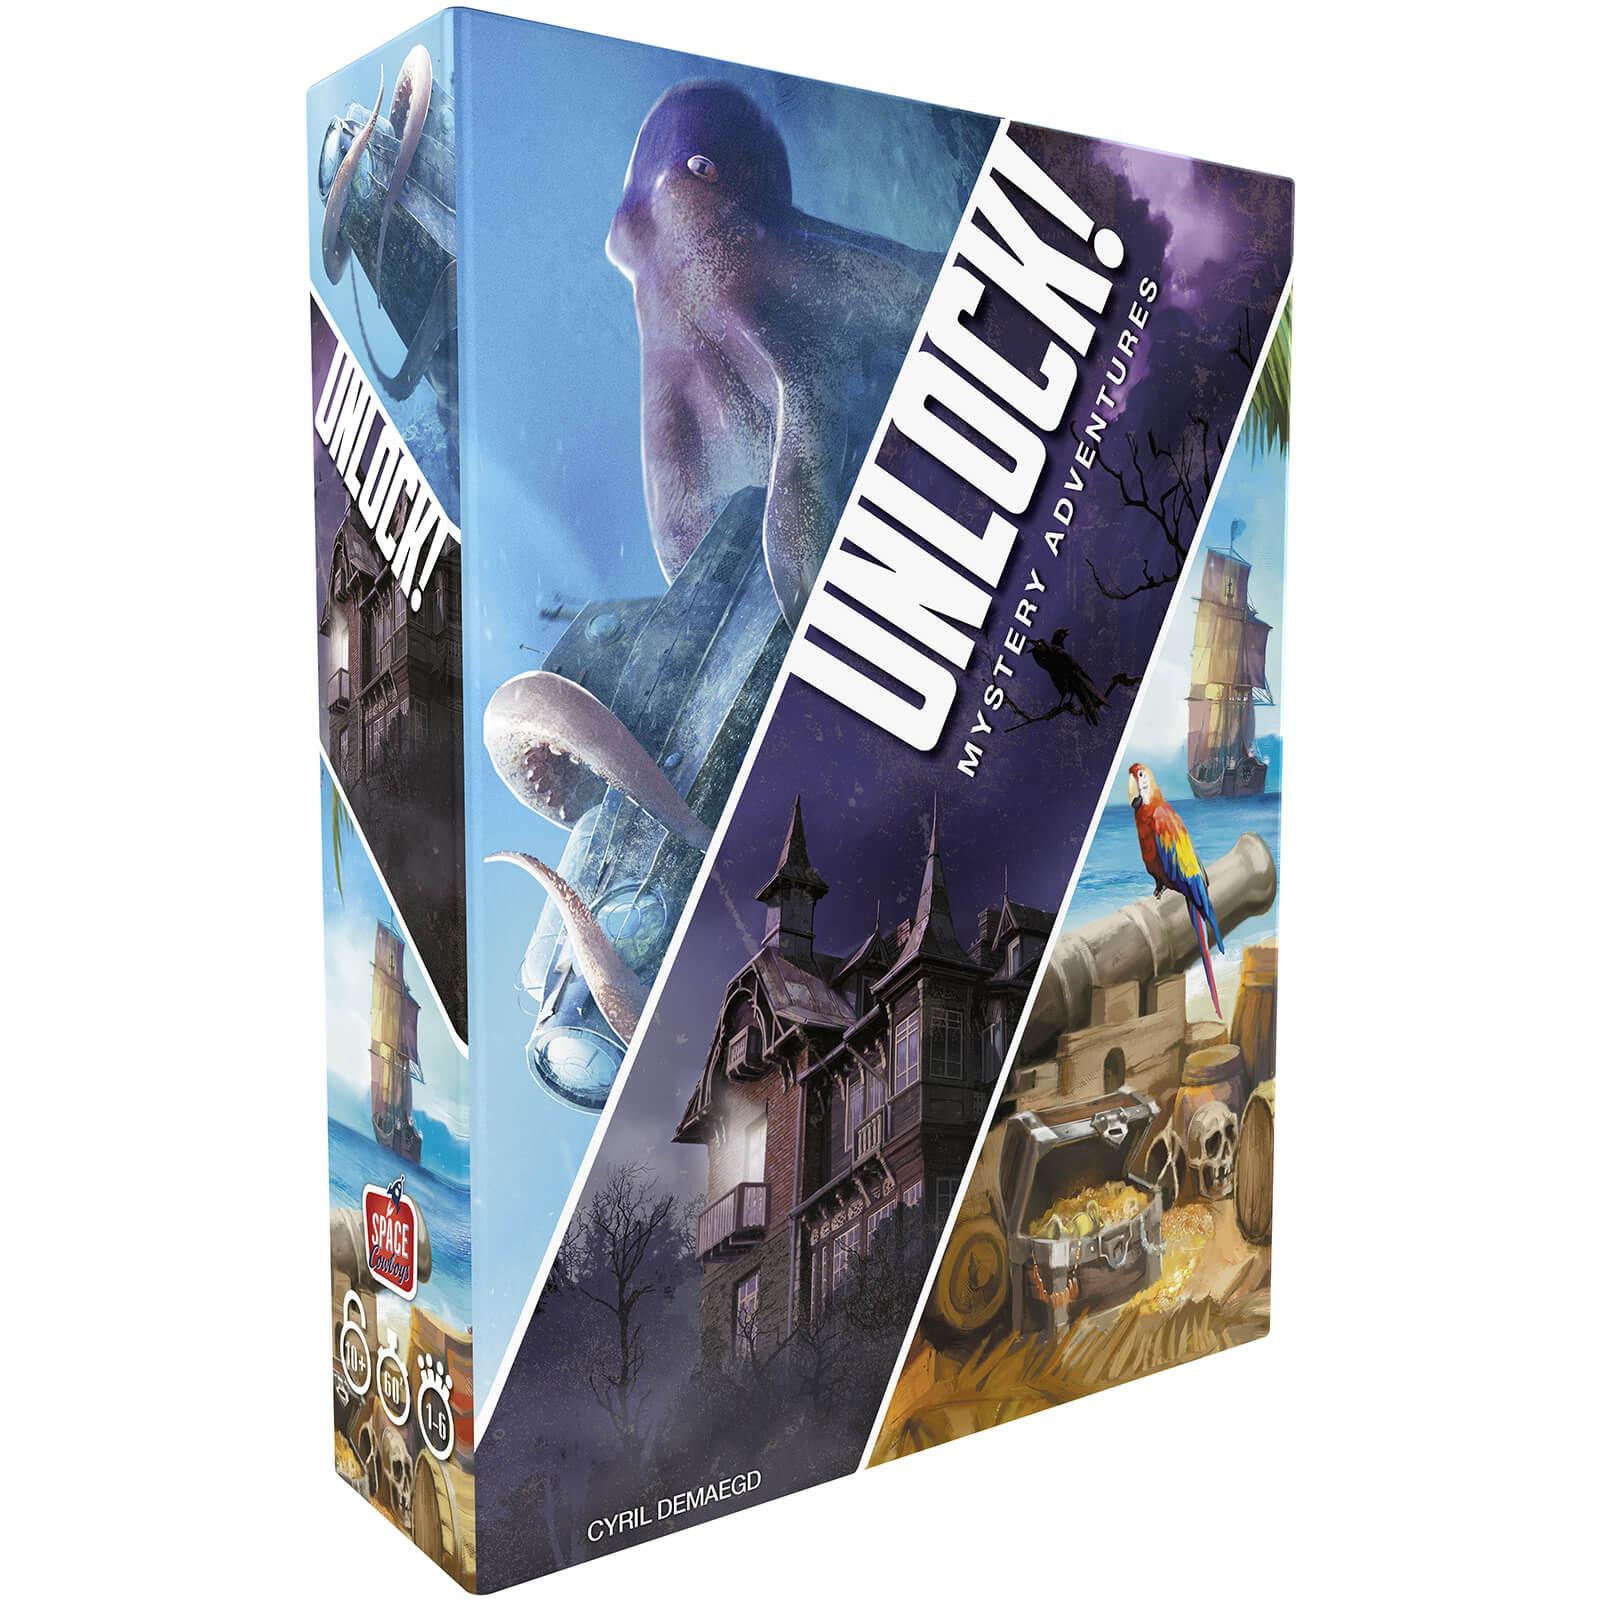 Image of Unlock 2! Game